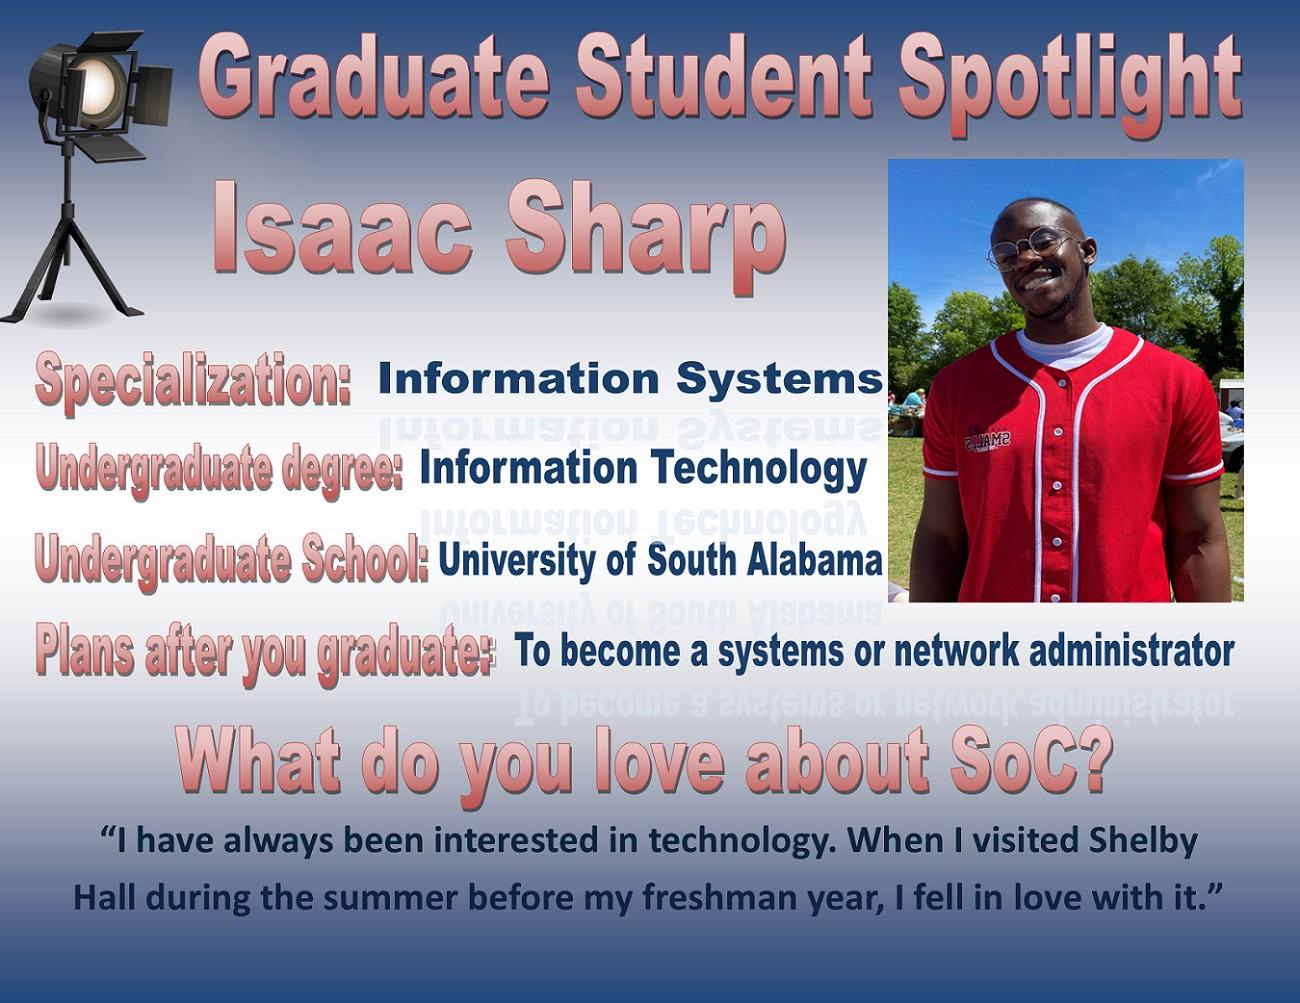 Graduate Student Spotlight - Issac Sharp